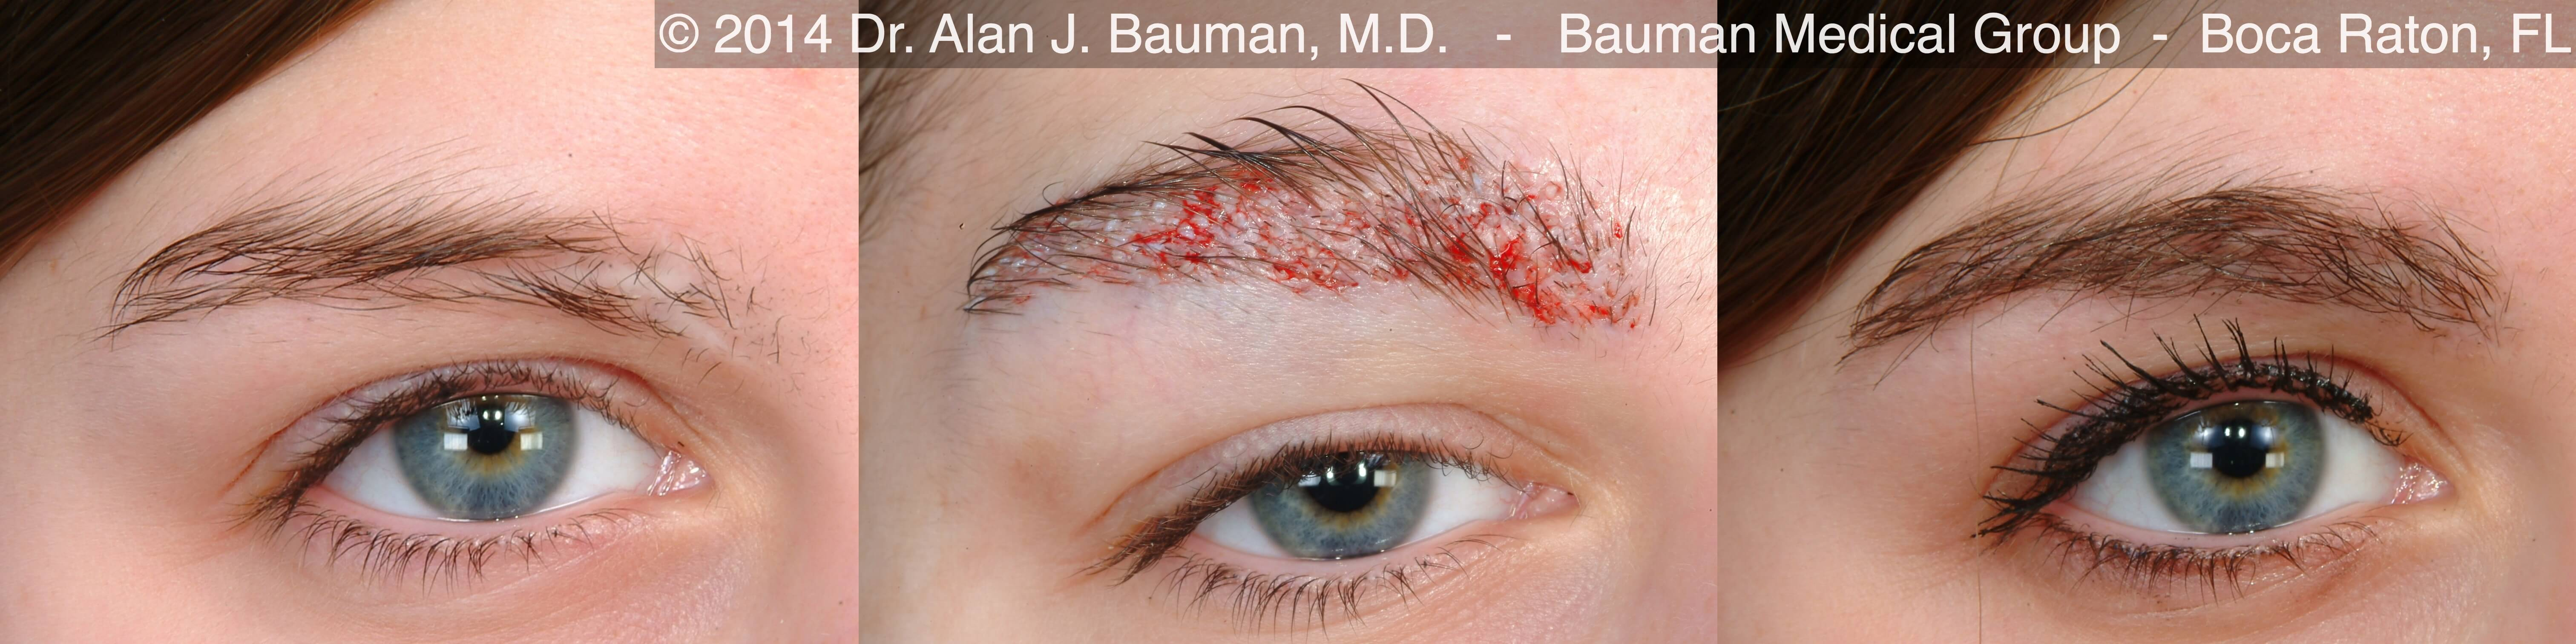 Eyebrow Transplantation Special Cases Bauman Medical Group